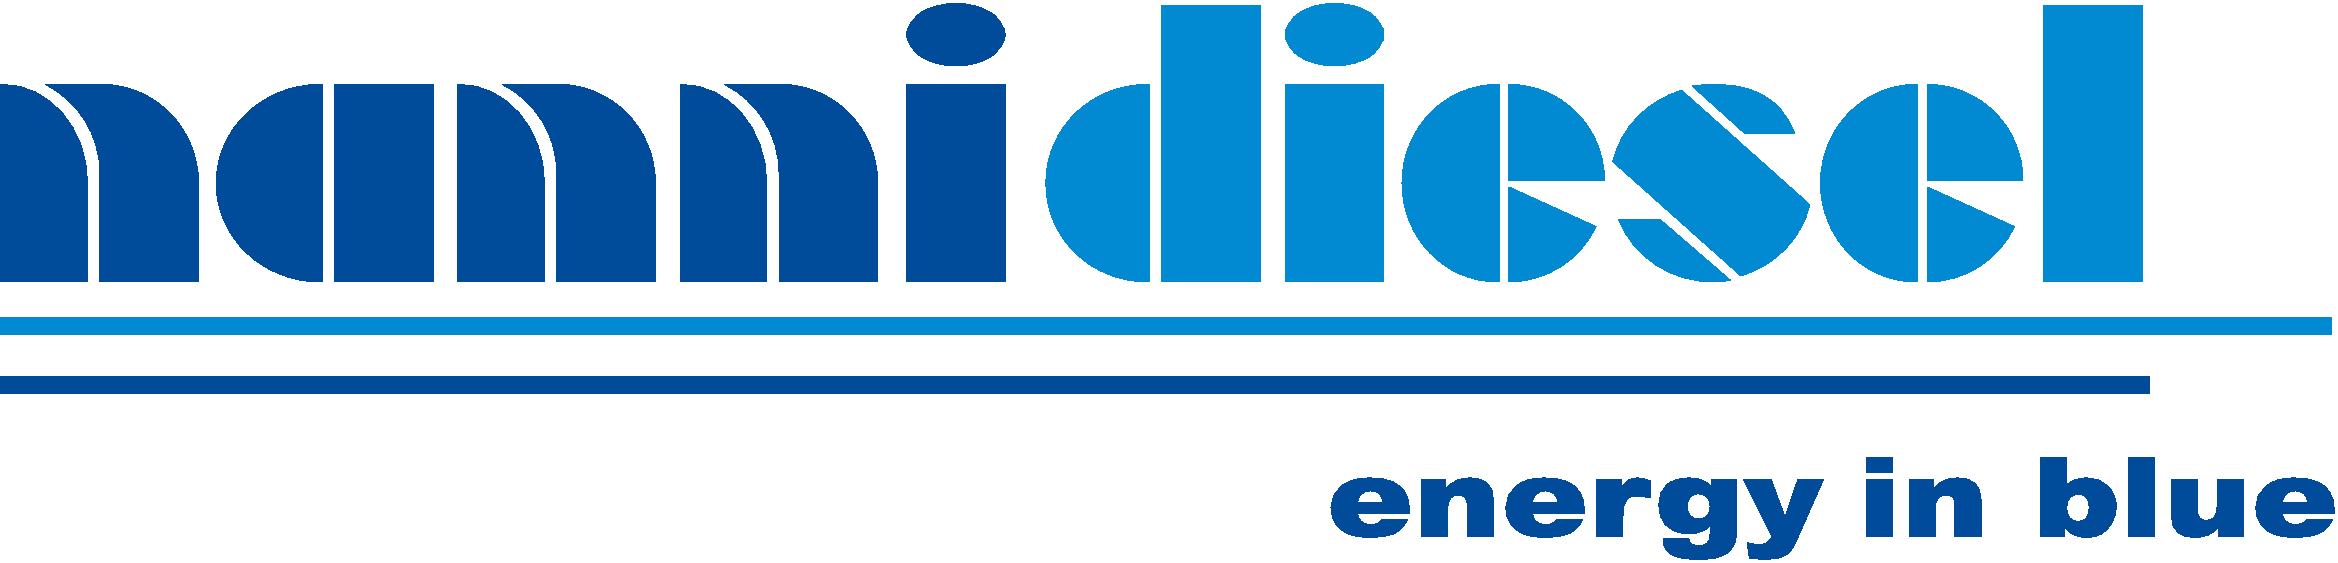 Nanni_logo